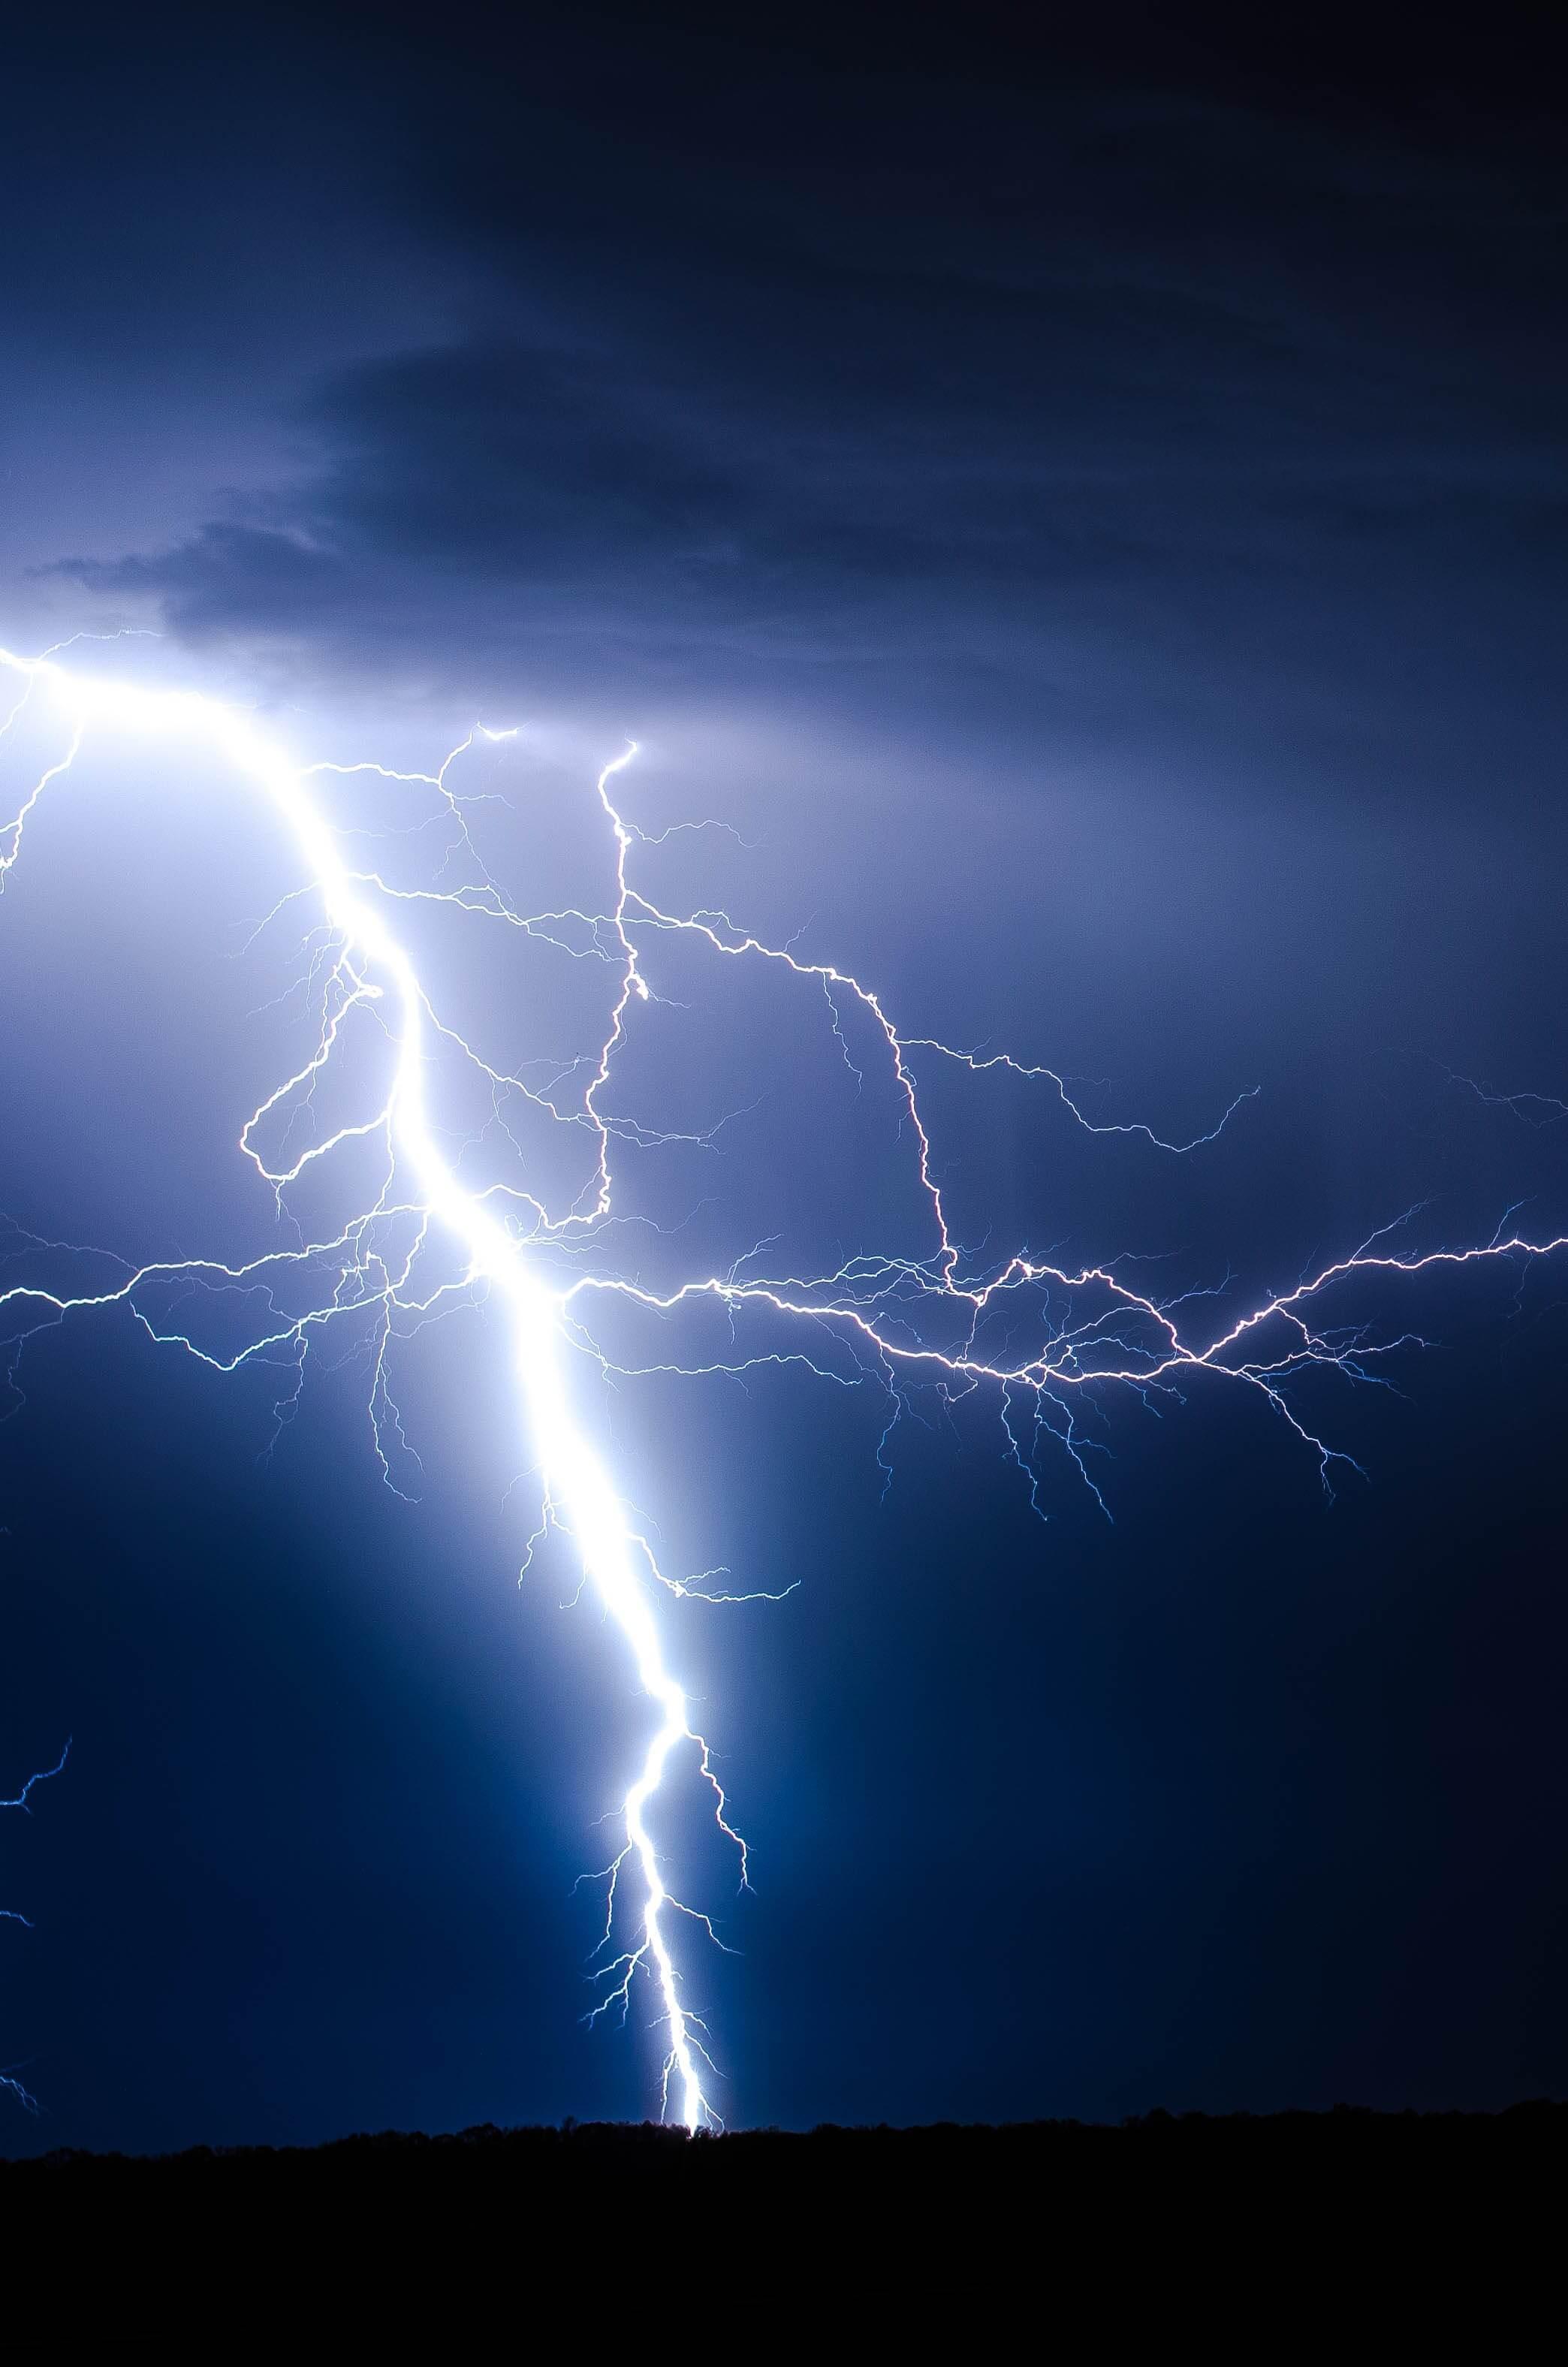 A bolt of lightning against a dark-blue sky.